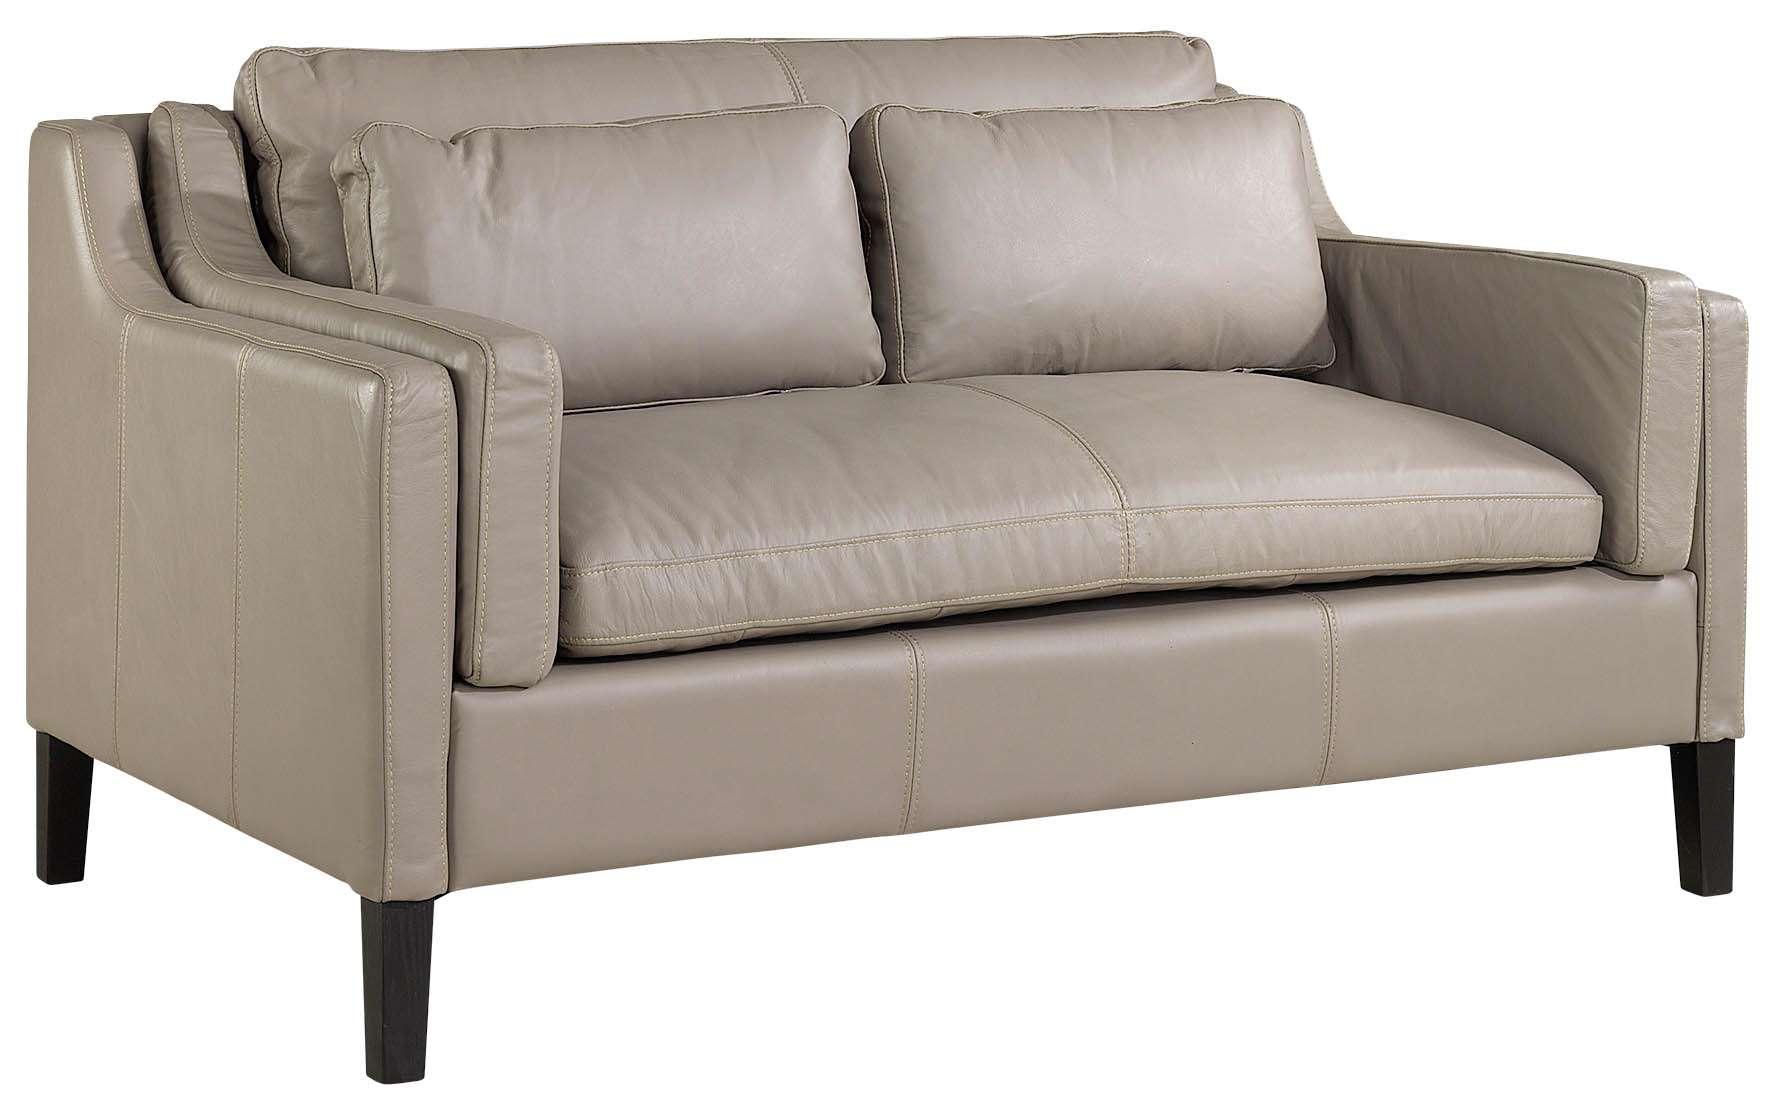 Dekoria Sofa Manchester 2-osobowa skórzana jasna -30%